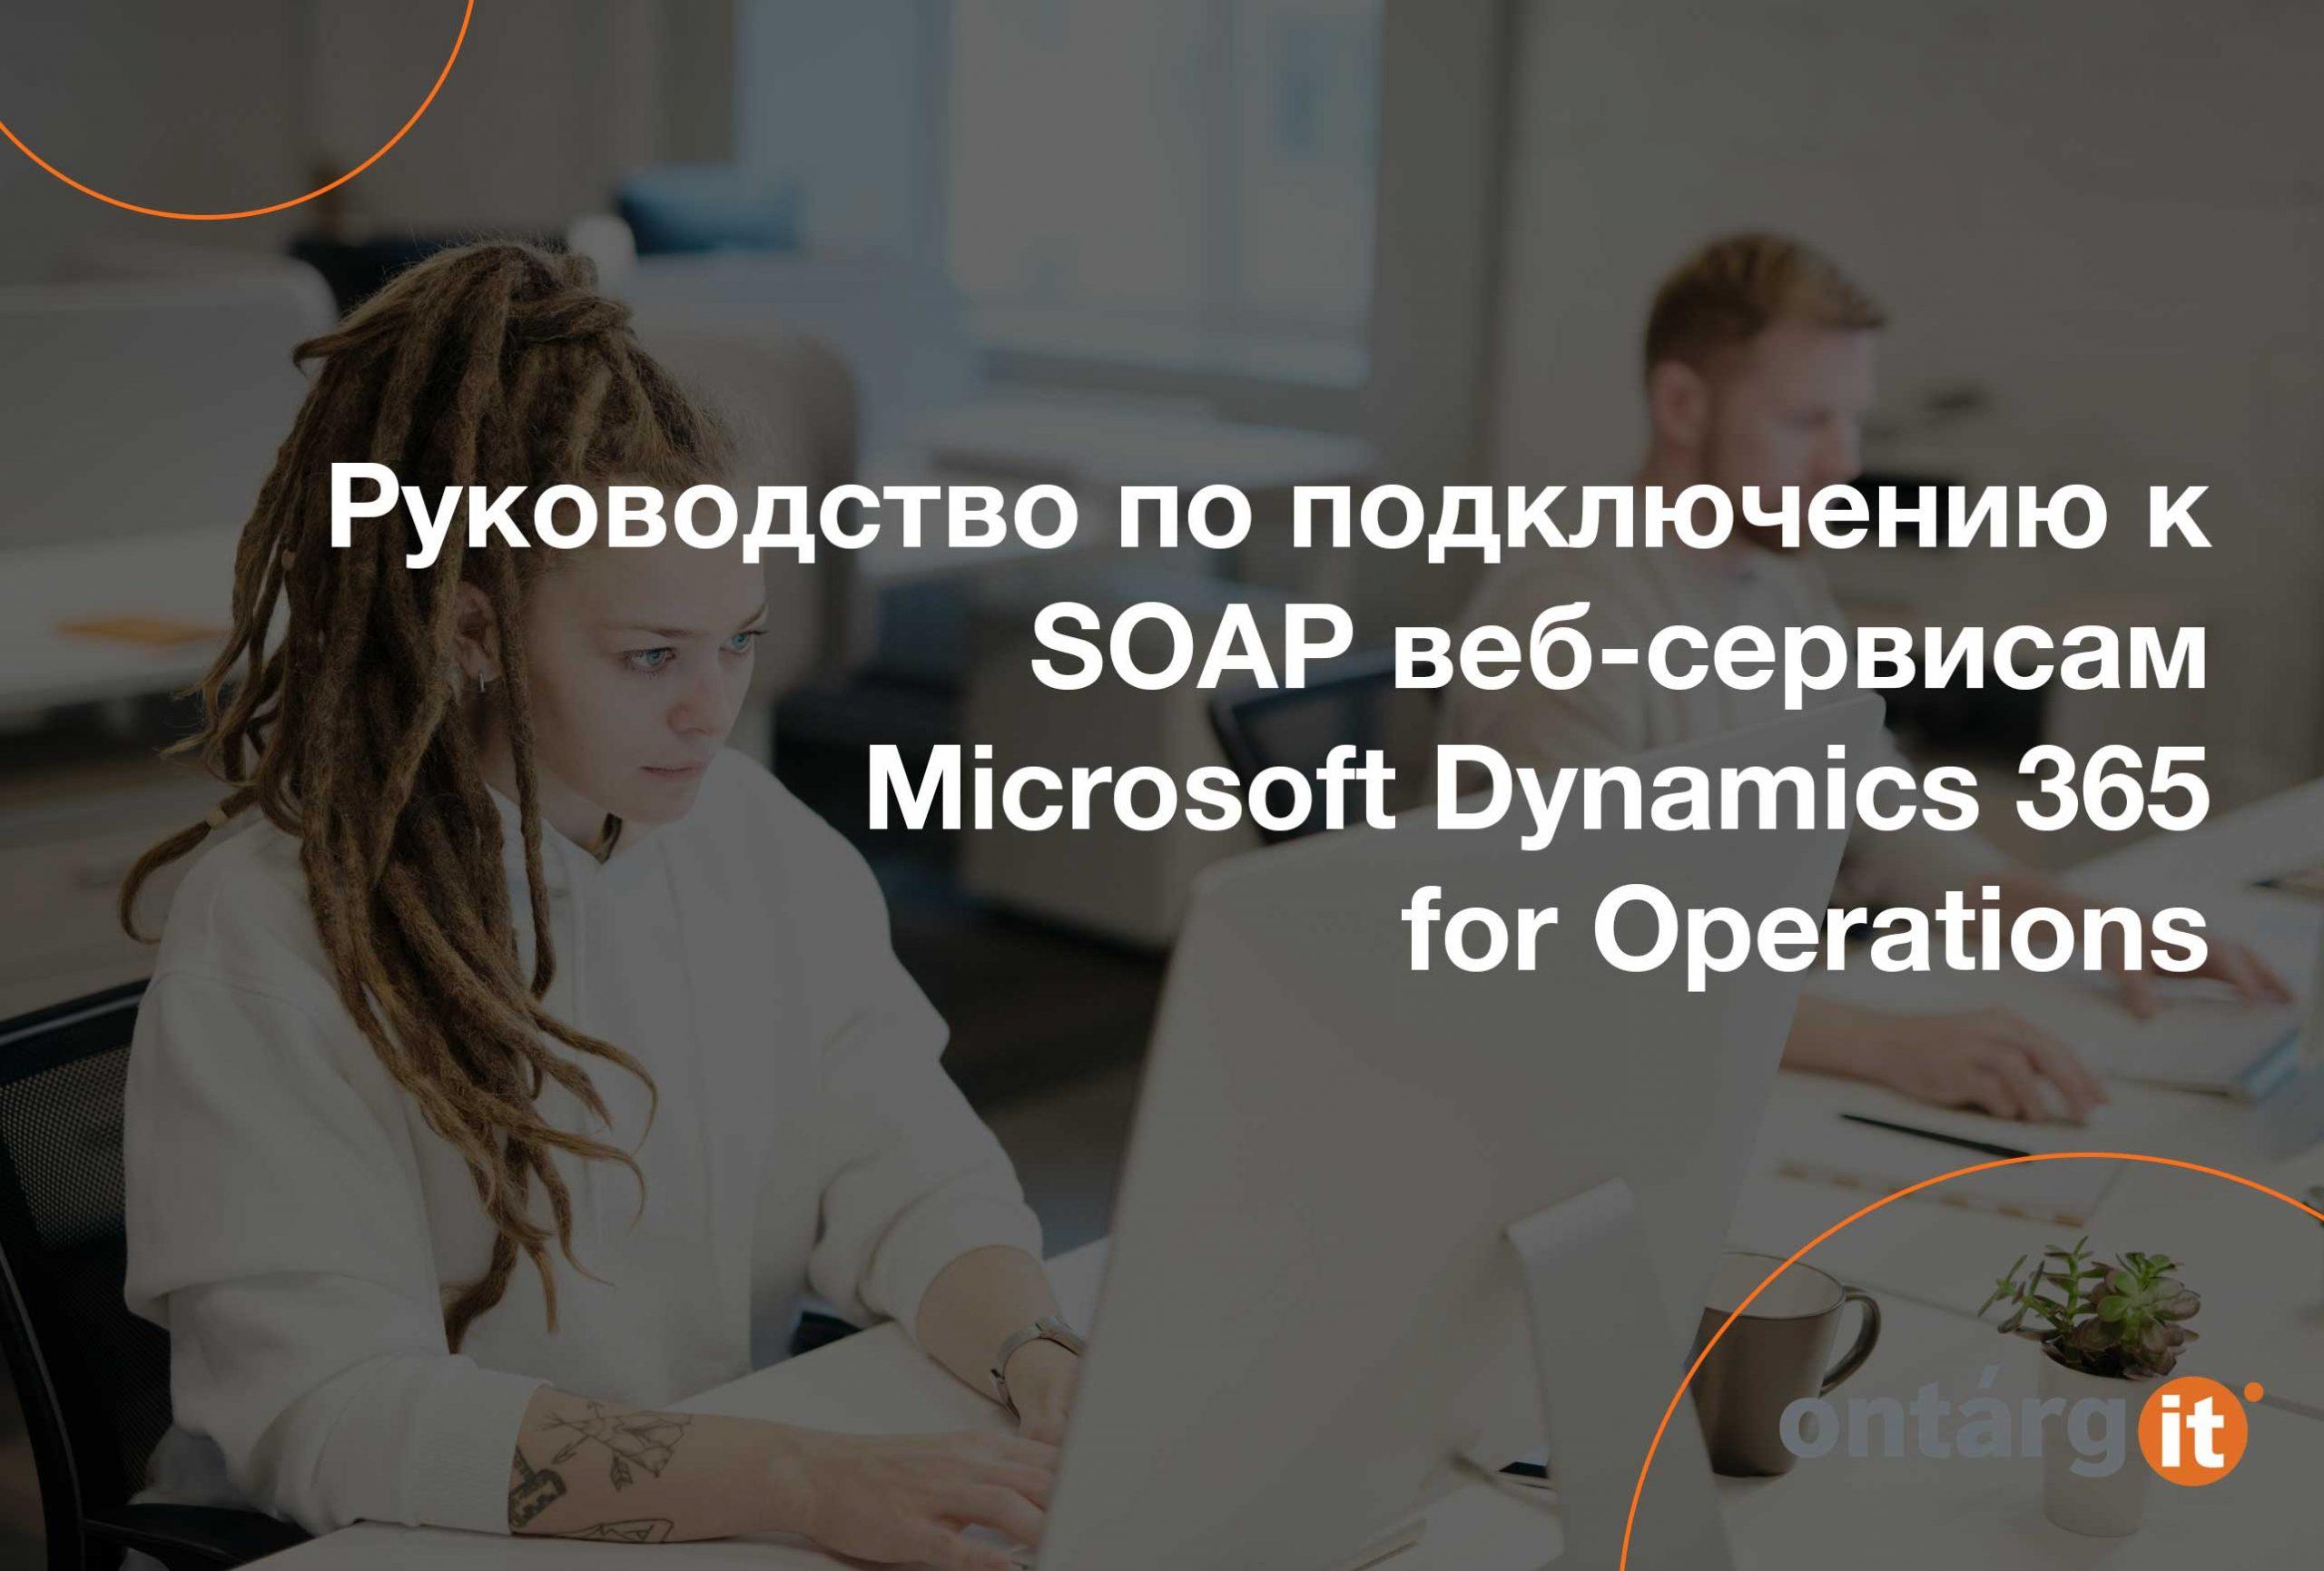 Руководство-по-подключению-к-SOAP-веб-сервисам-Microsoft-Dynamics-365-for-Operations